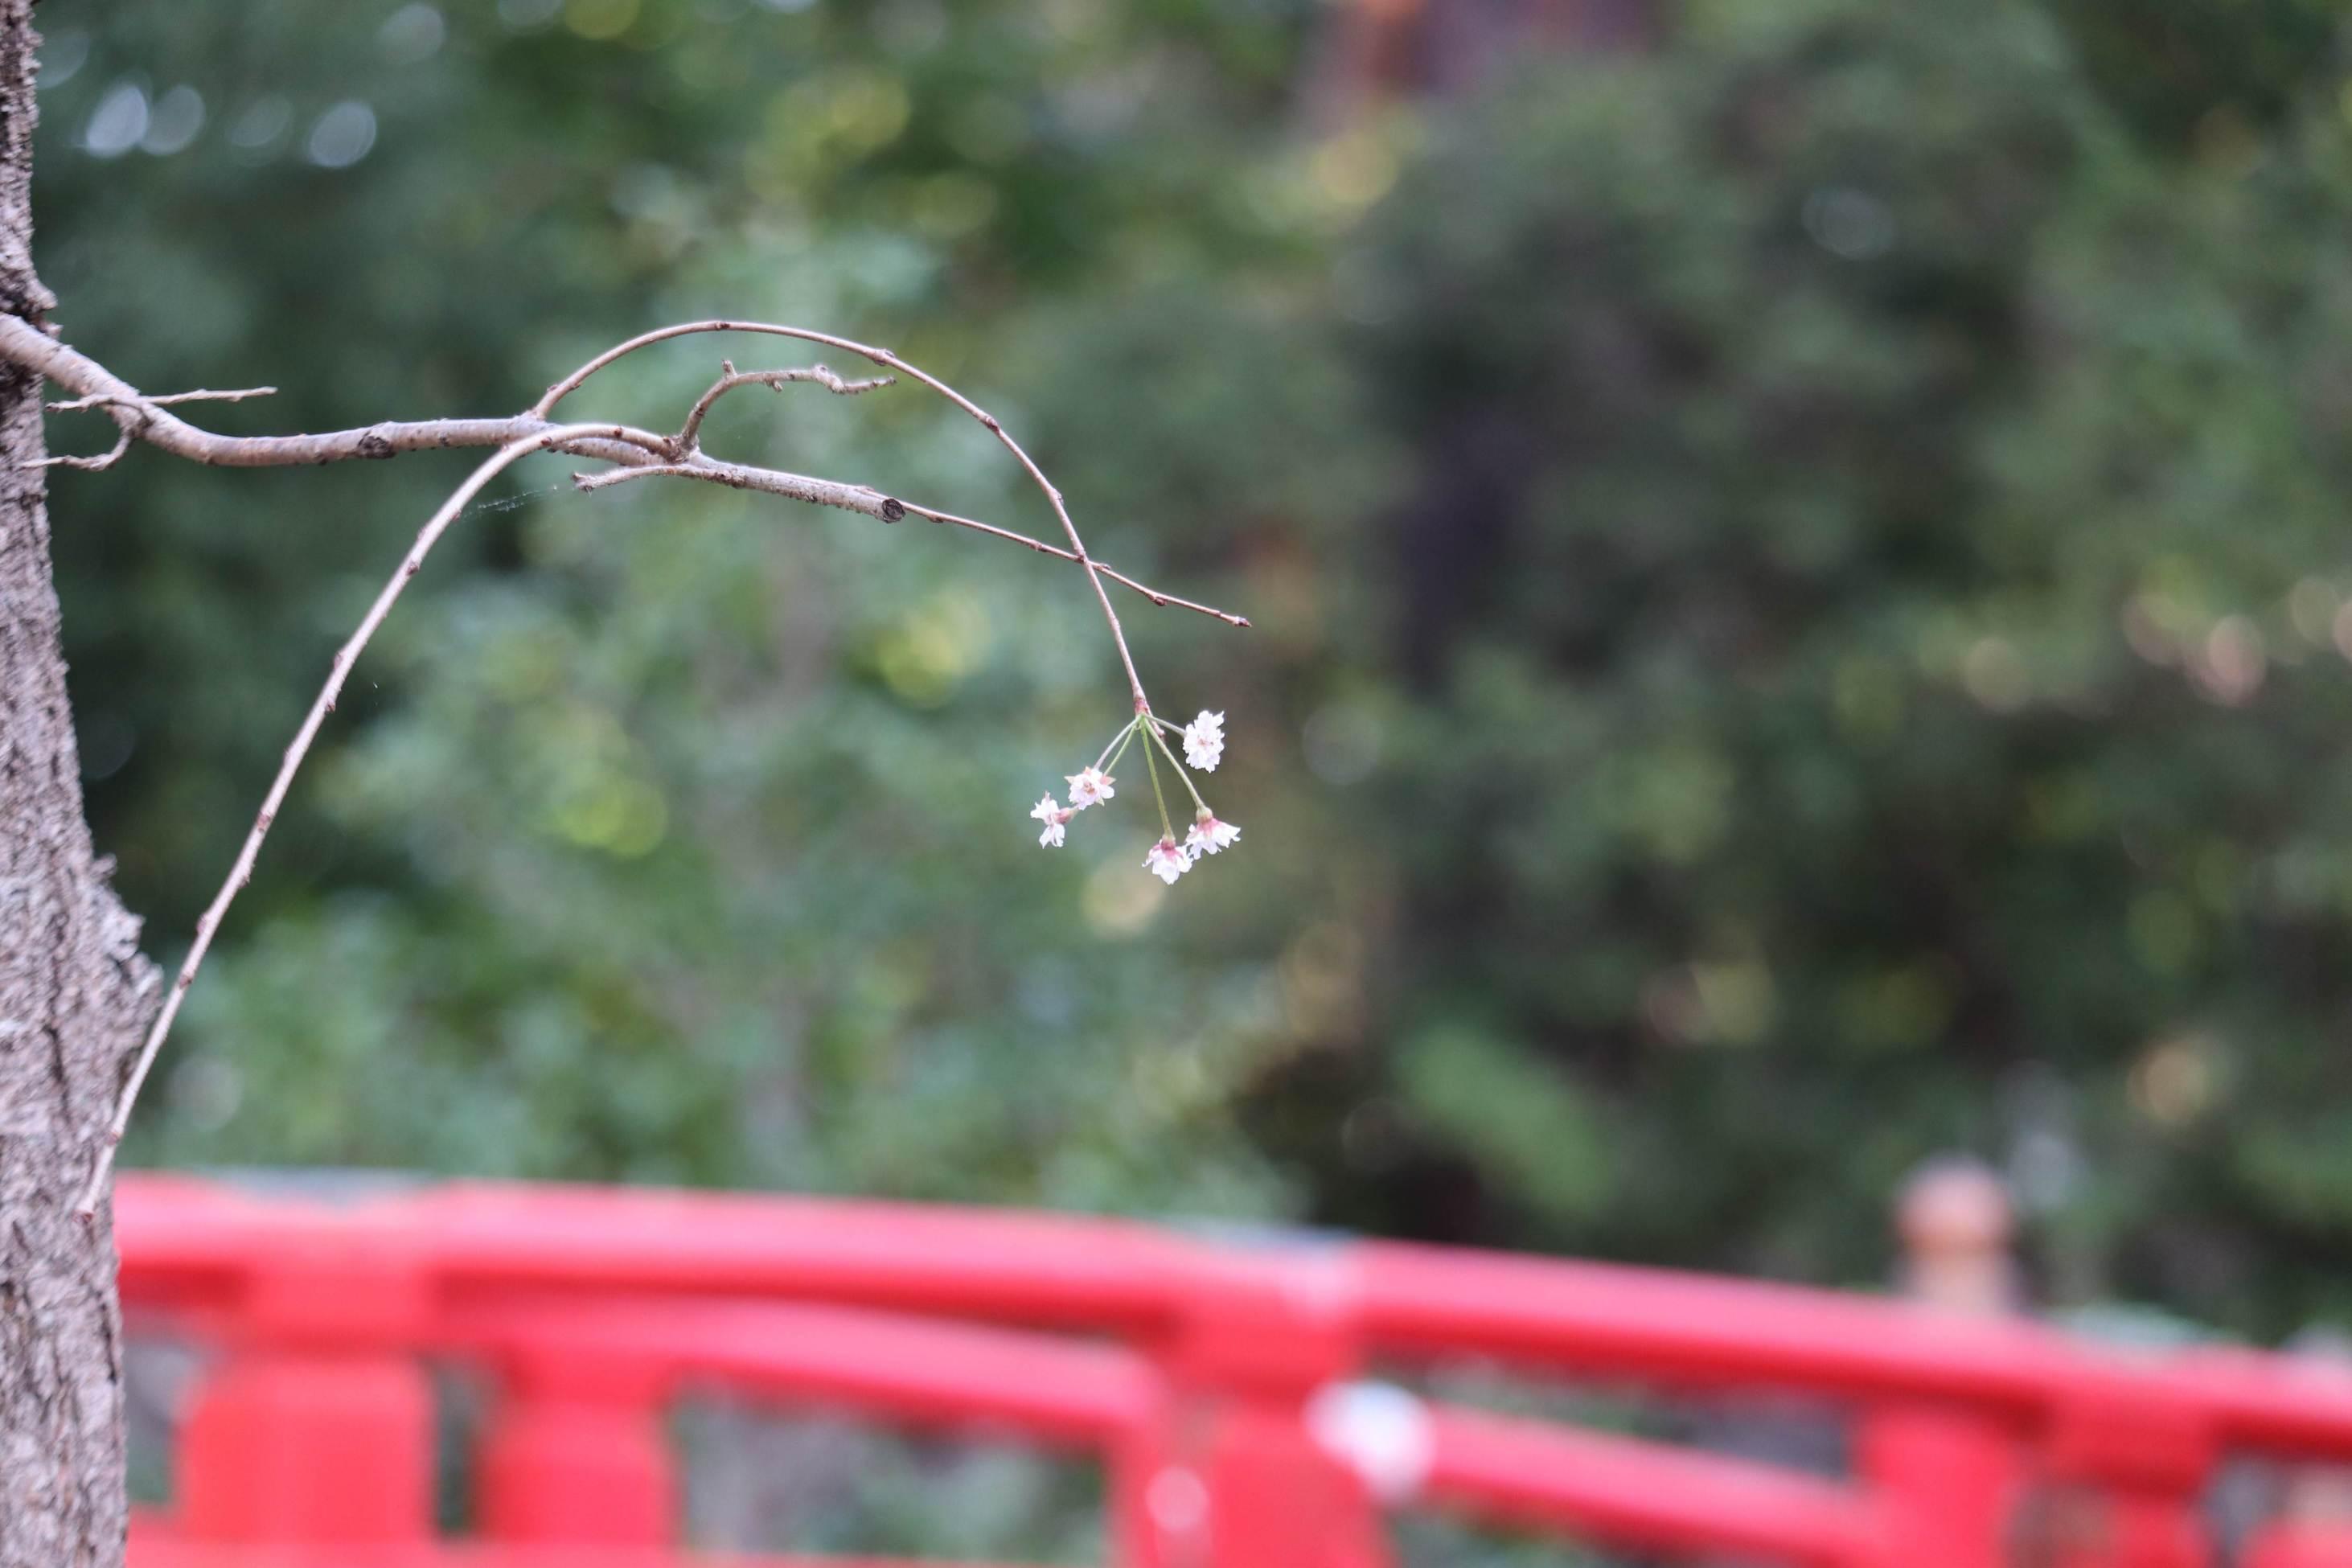 Cherry Blossoms in Autumn: Japan Weather Expert Explains 'Surprise' Sight